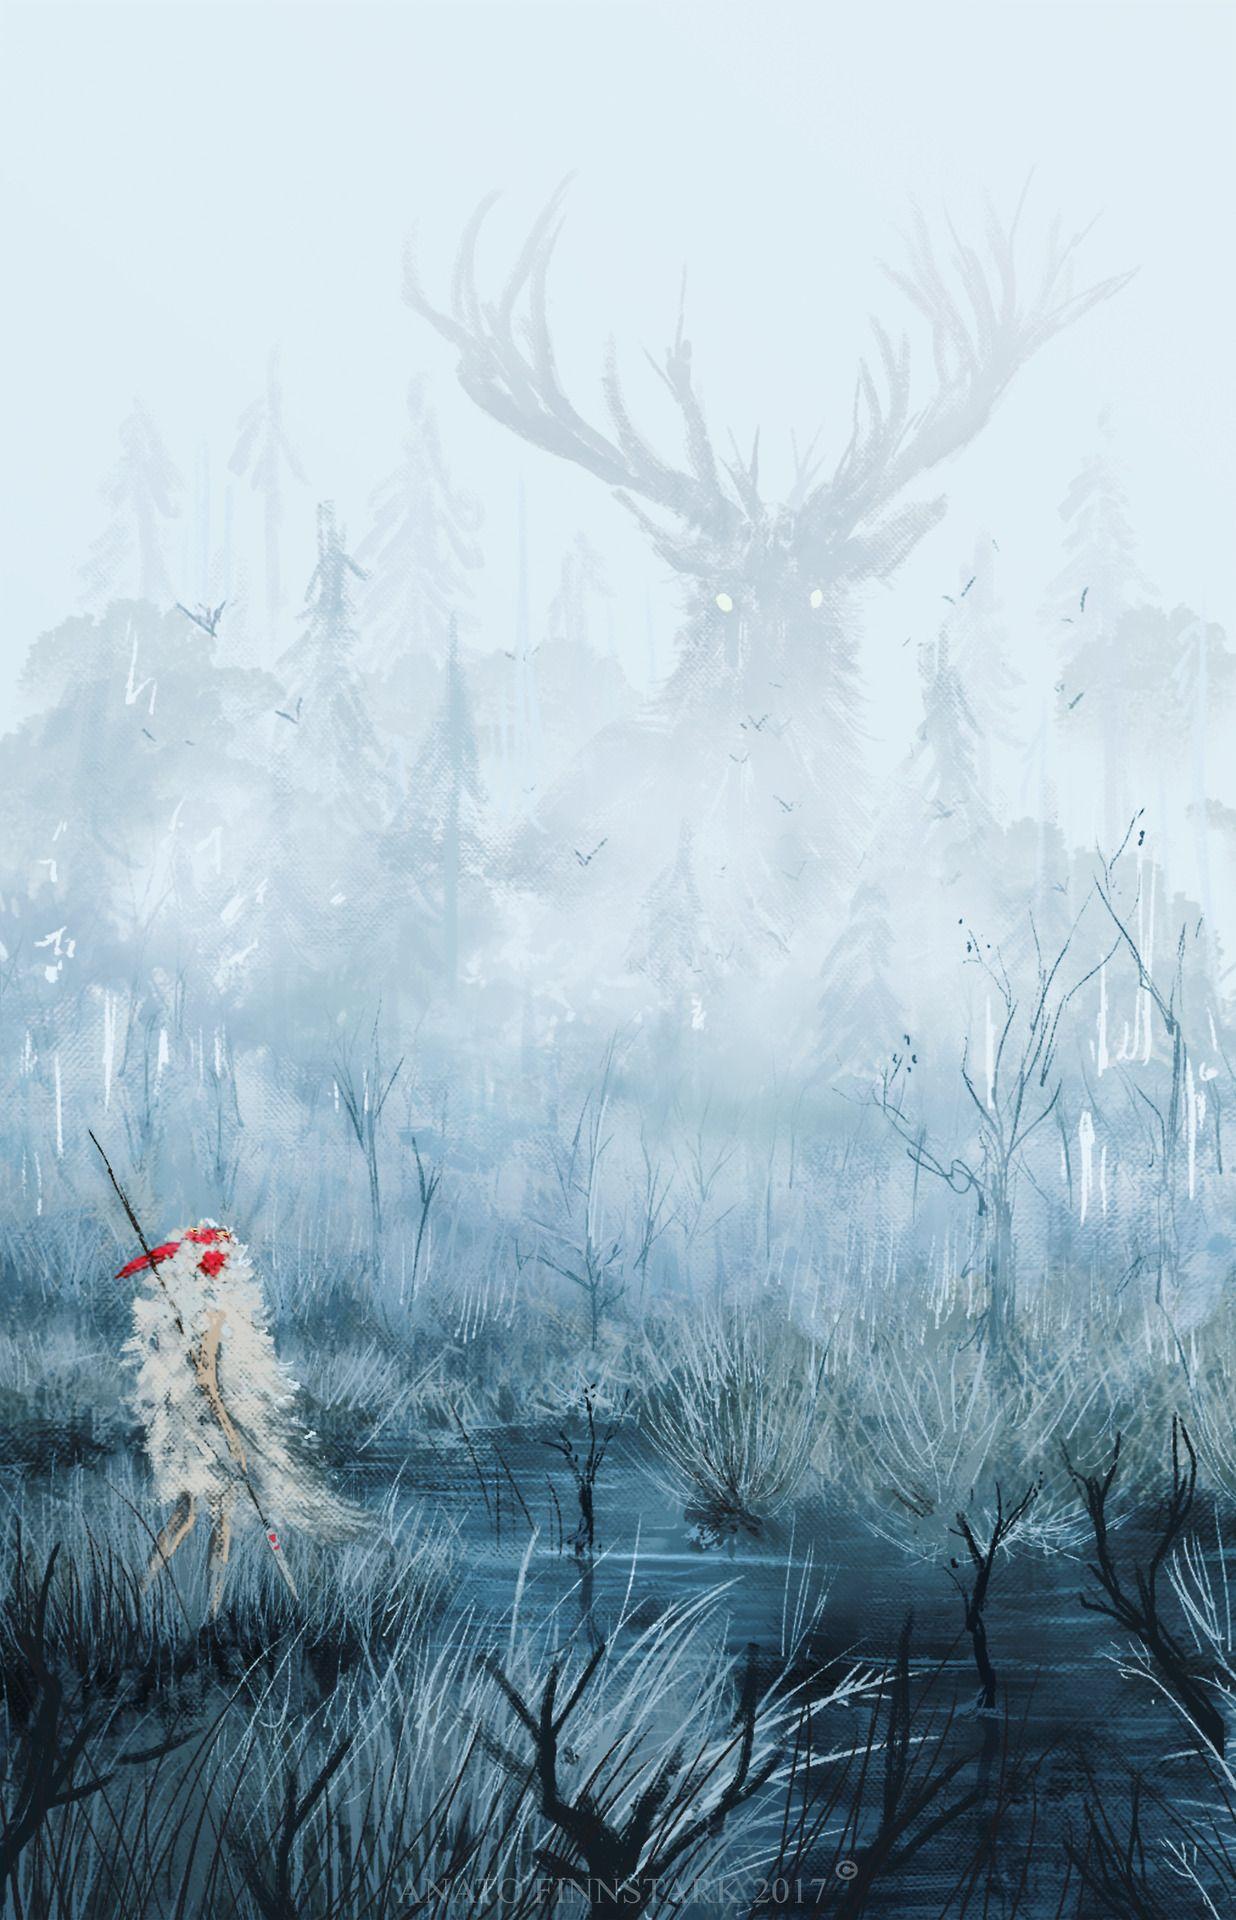 Anato Finnstark Illustrations Photo Princess Mononoke ジブリ イラスト 綺麗なイラスト 壁紙背景 壁紙 ジブリ